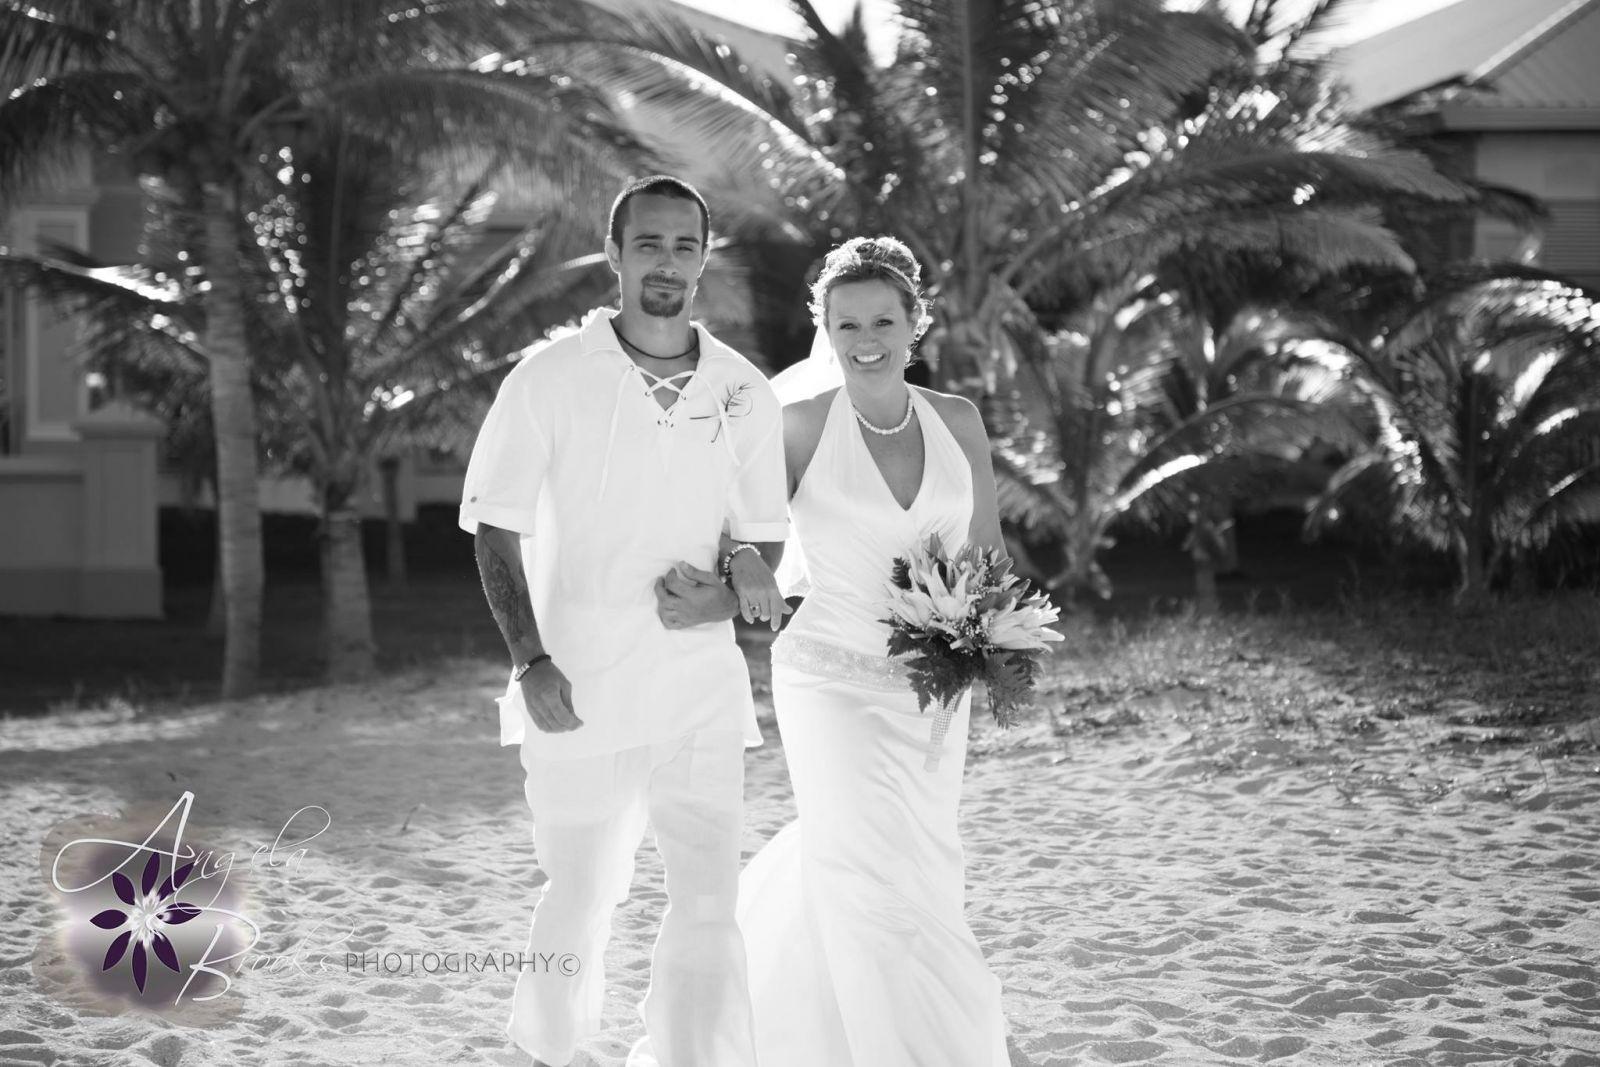 Wedding pics from Angela Brooks Photography